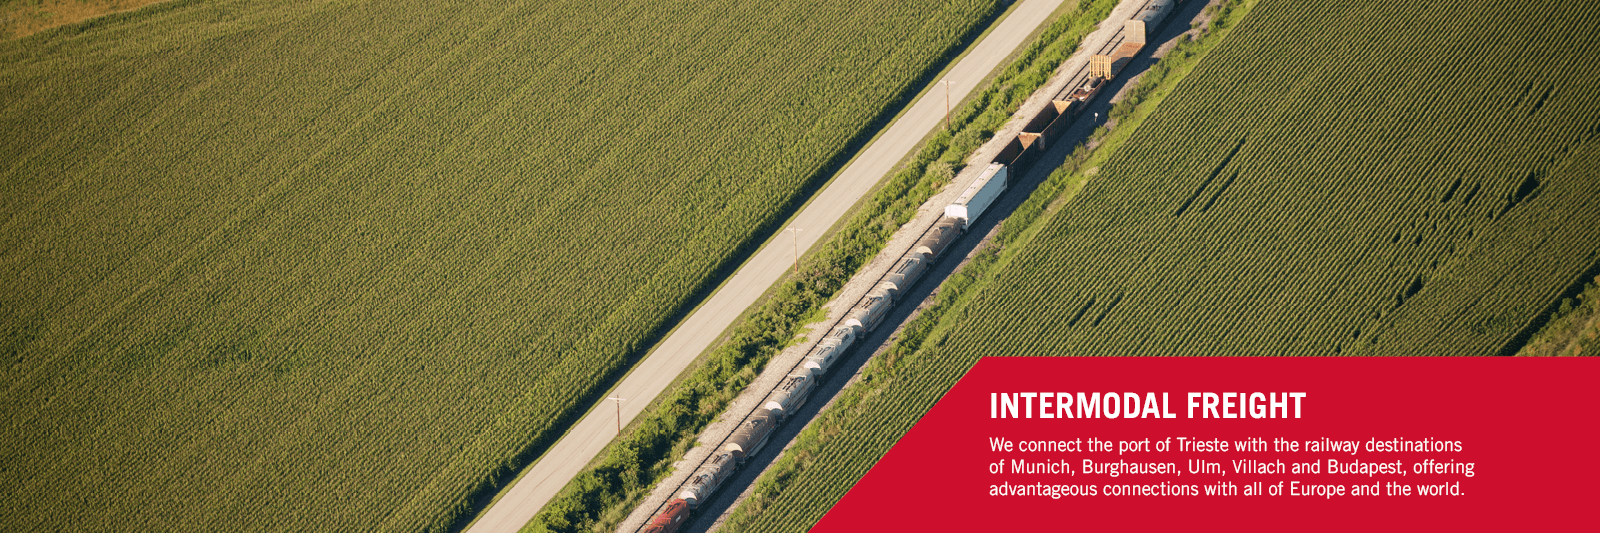 Intermodal Freight 1